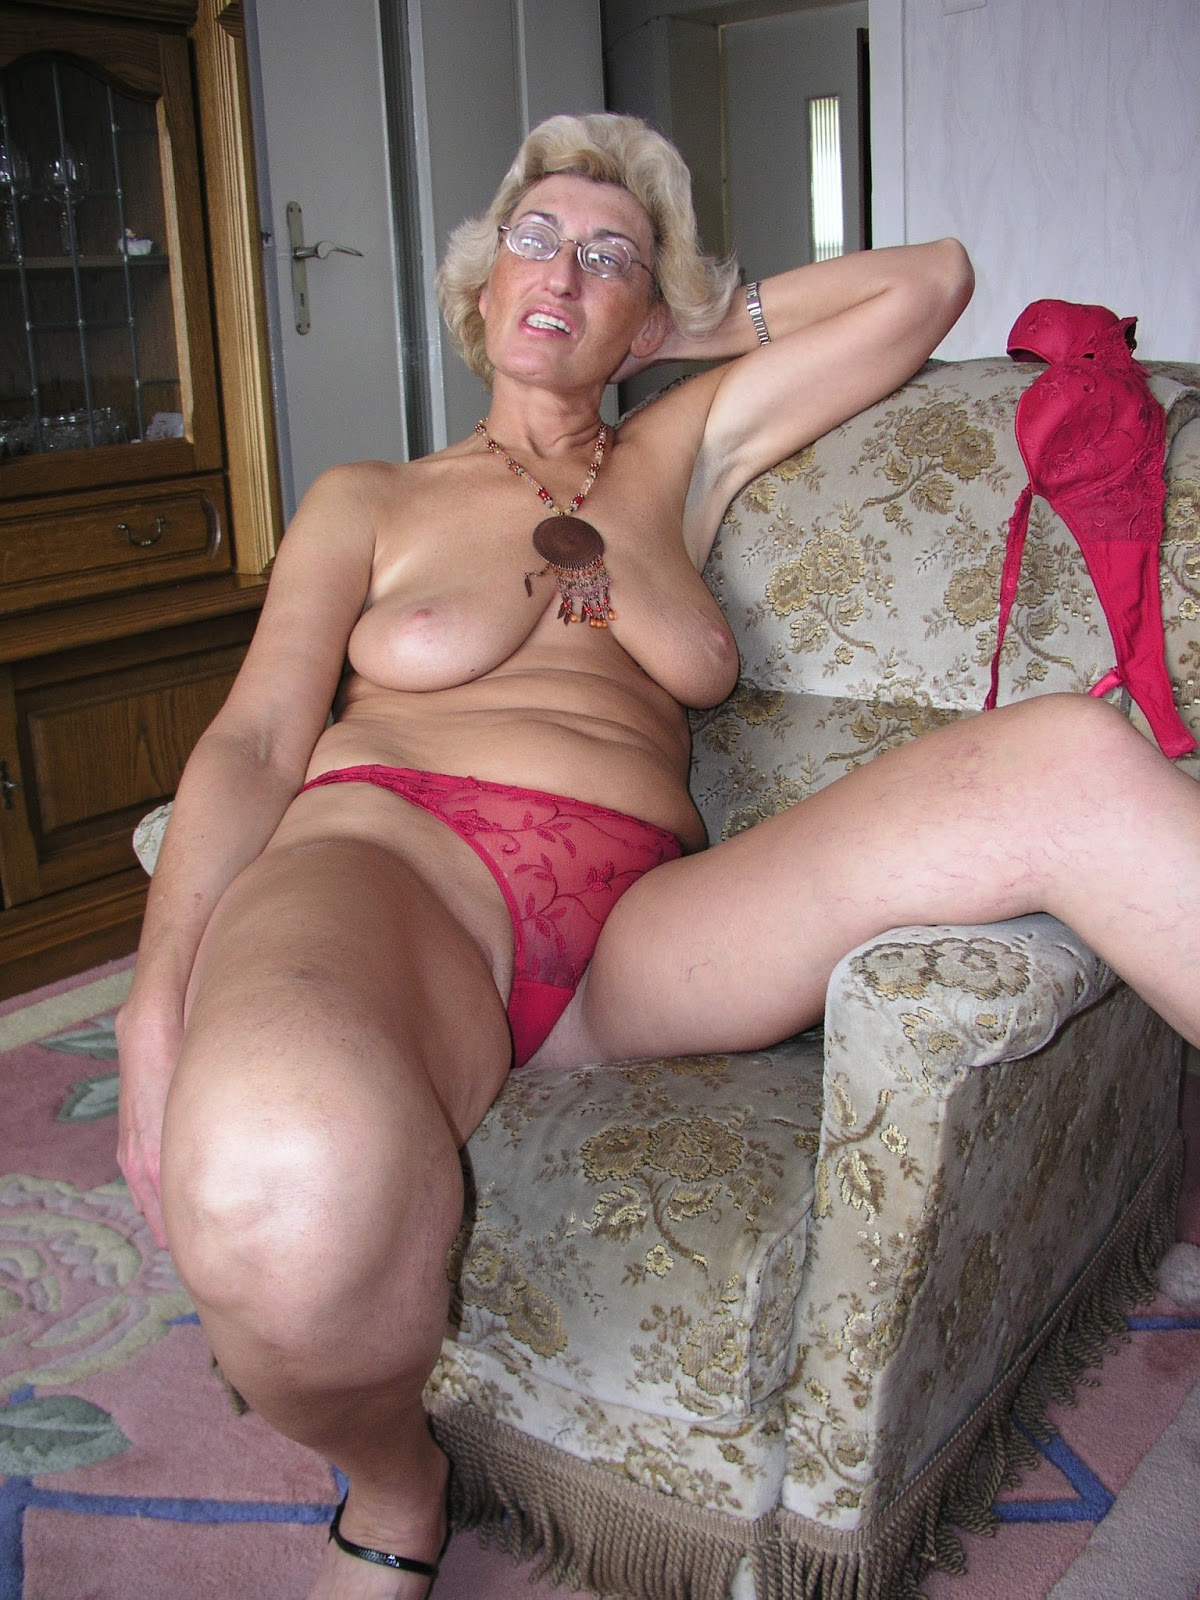 Free mature women picyures